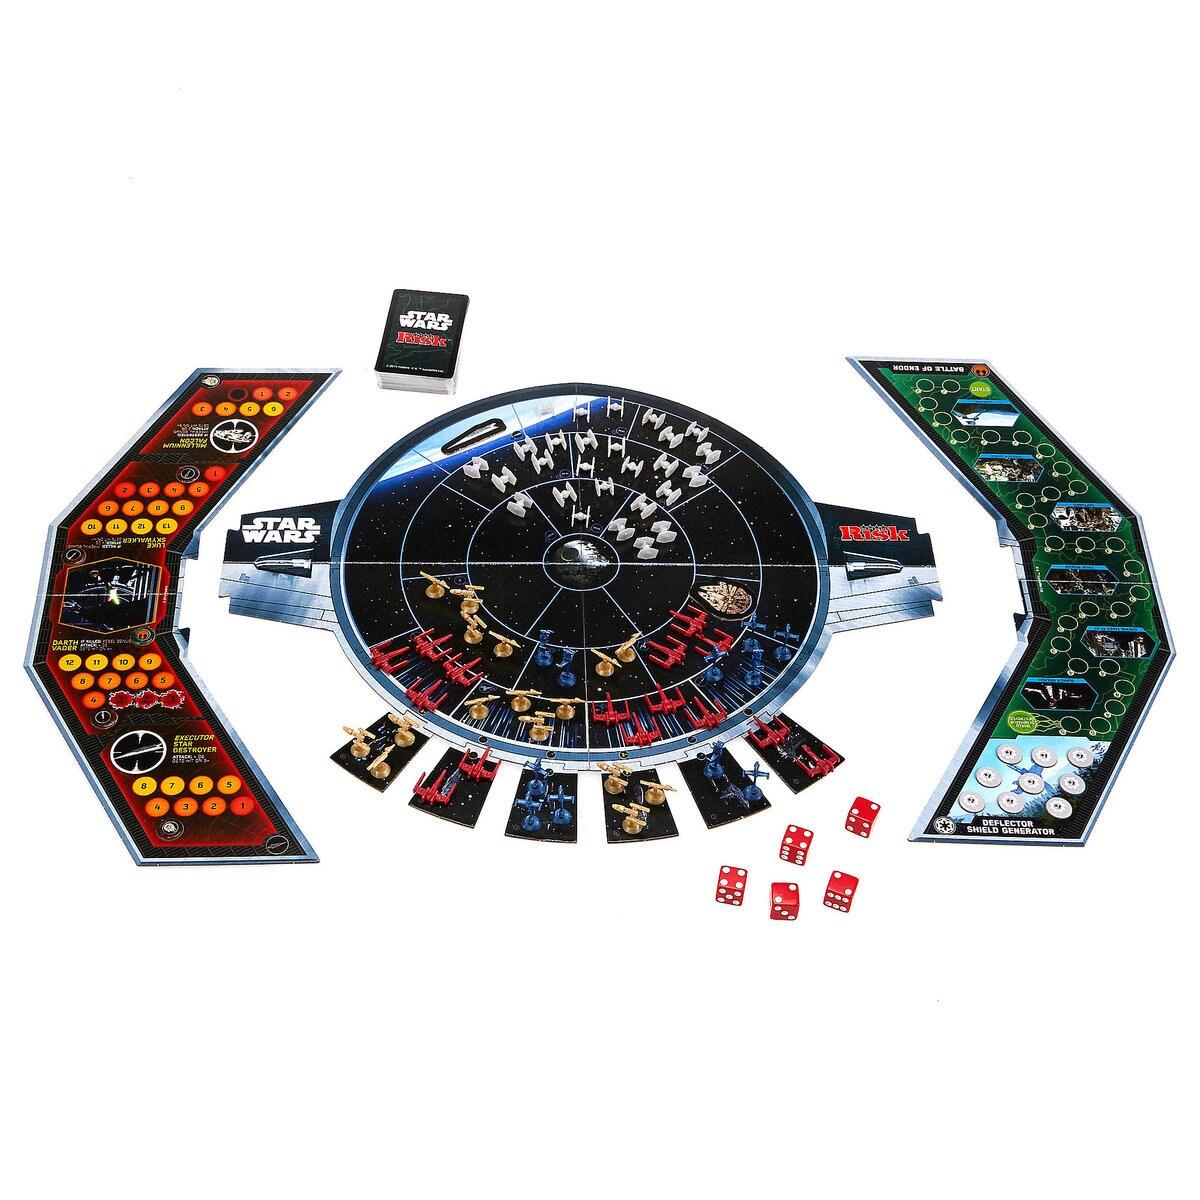 Star Wars Risk Game | shopDisney